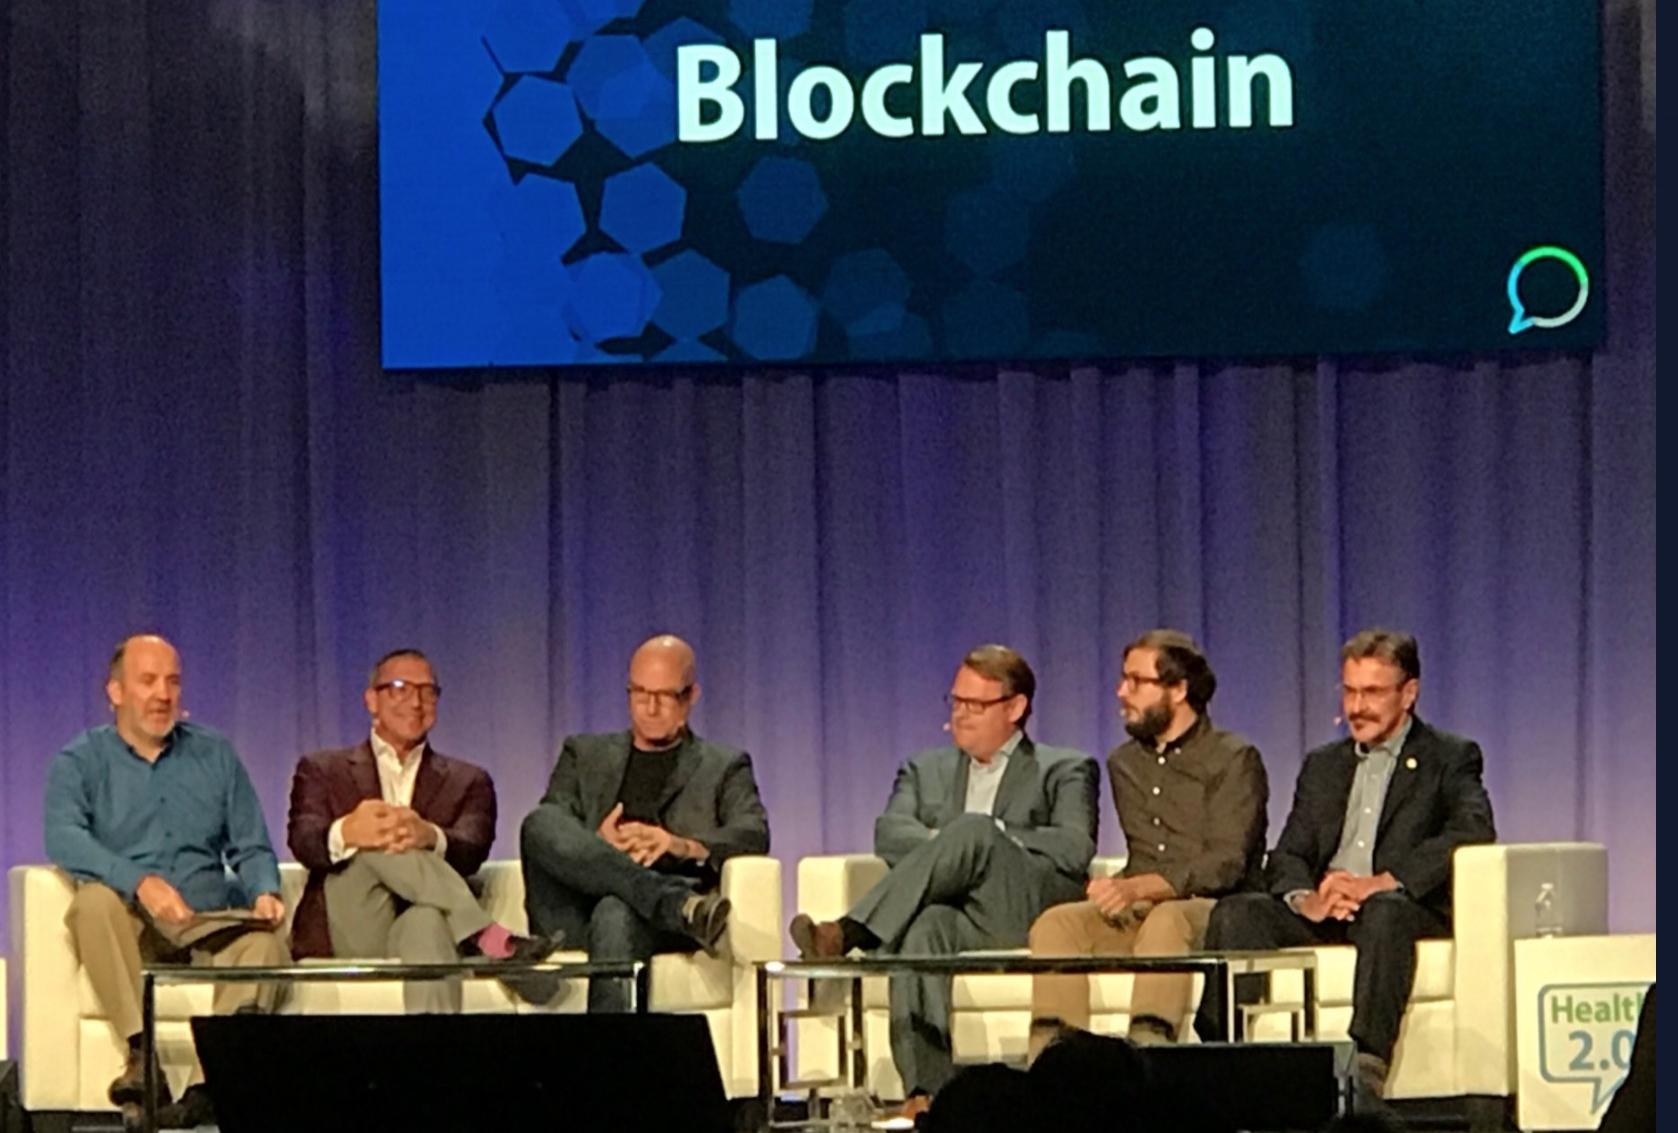 Jack Lewin at Health 2.0 BlockChain Panel.jpg